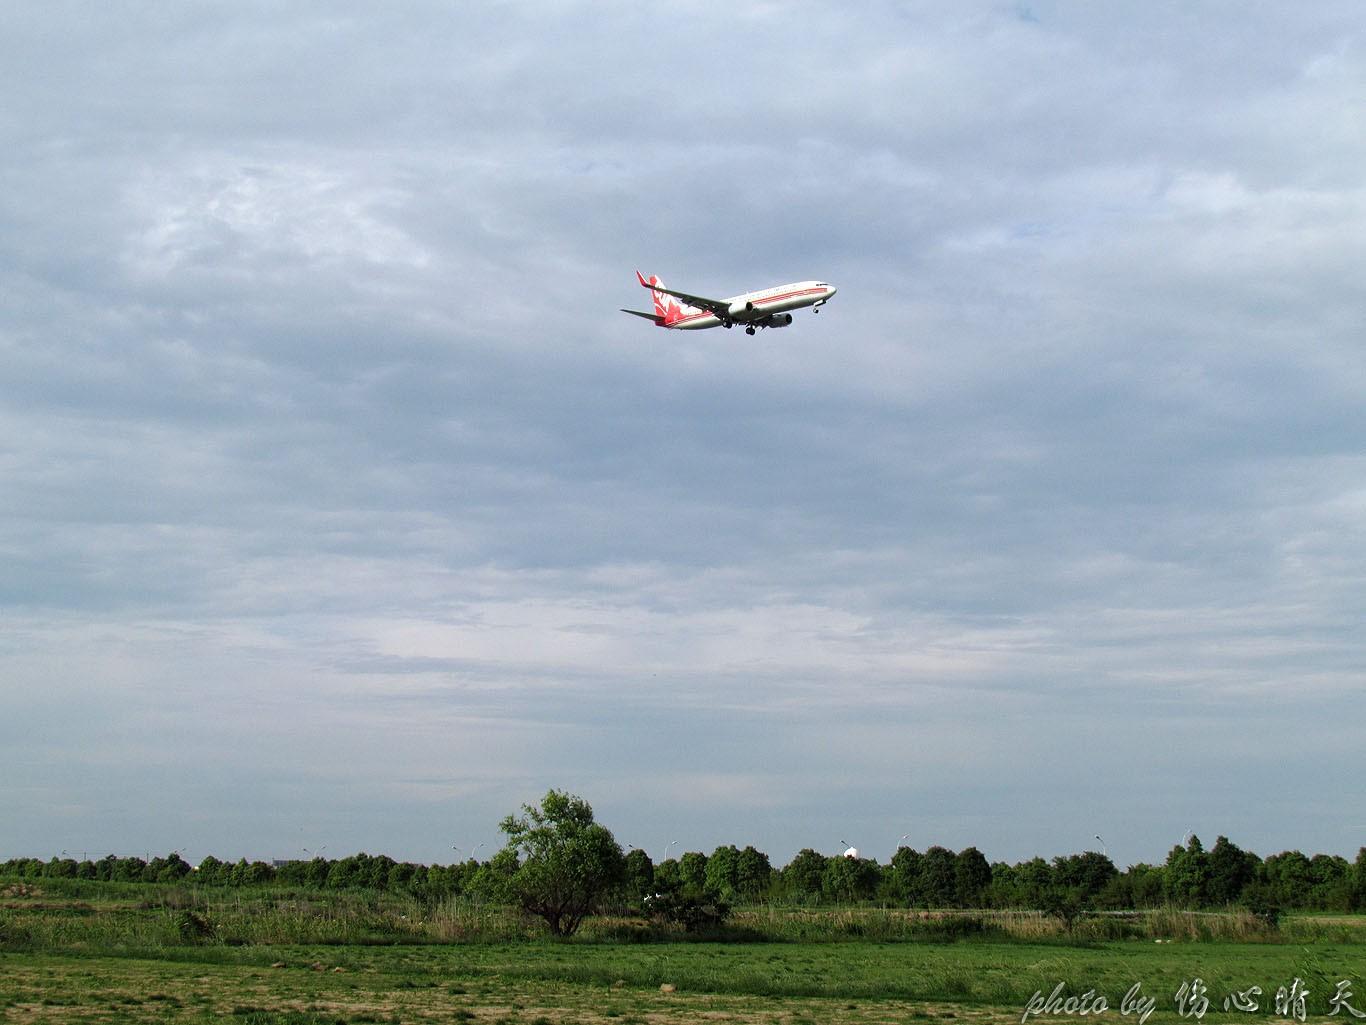 Re:[原创]PVG联盟彩绘的一天!地主、越南、AA、QF、大韩……就差星空了! AIRBUS A330-200 B-5902 中国上海浦东国际机场 中国上海浦东国际机场